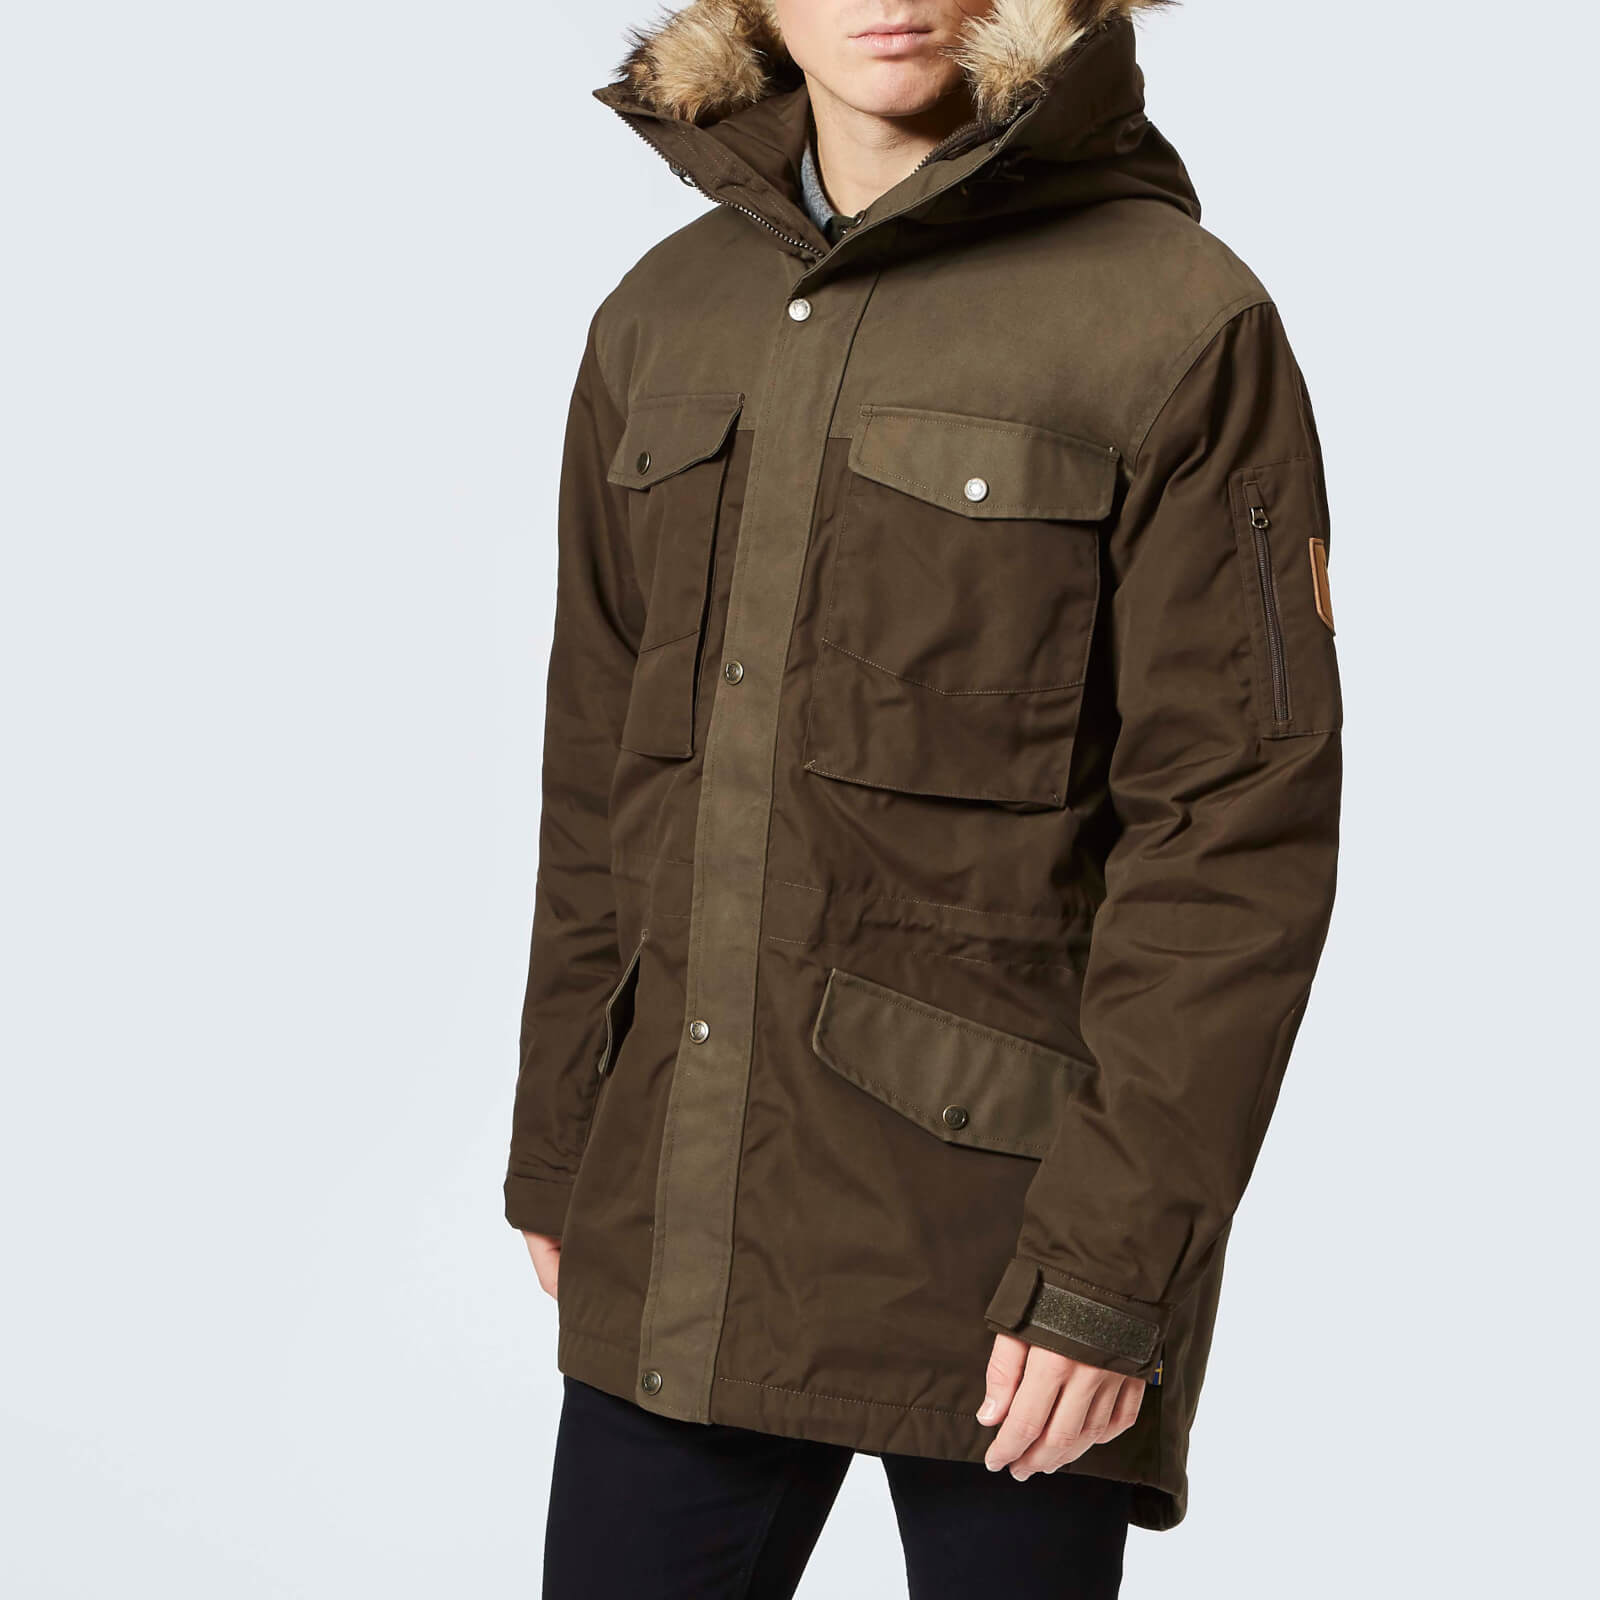 cheap price factory authentic huge selection of Fjallraven Men's Singi Winter Jacket - Dark Olive